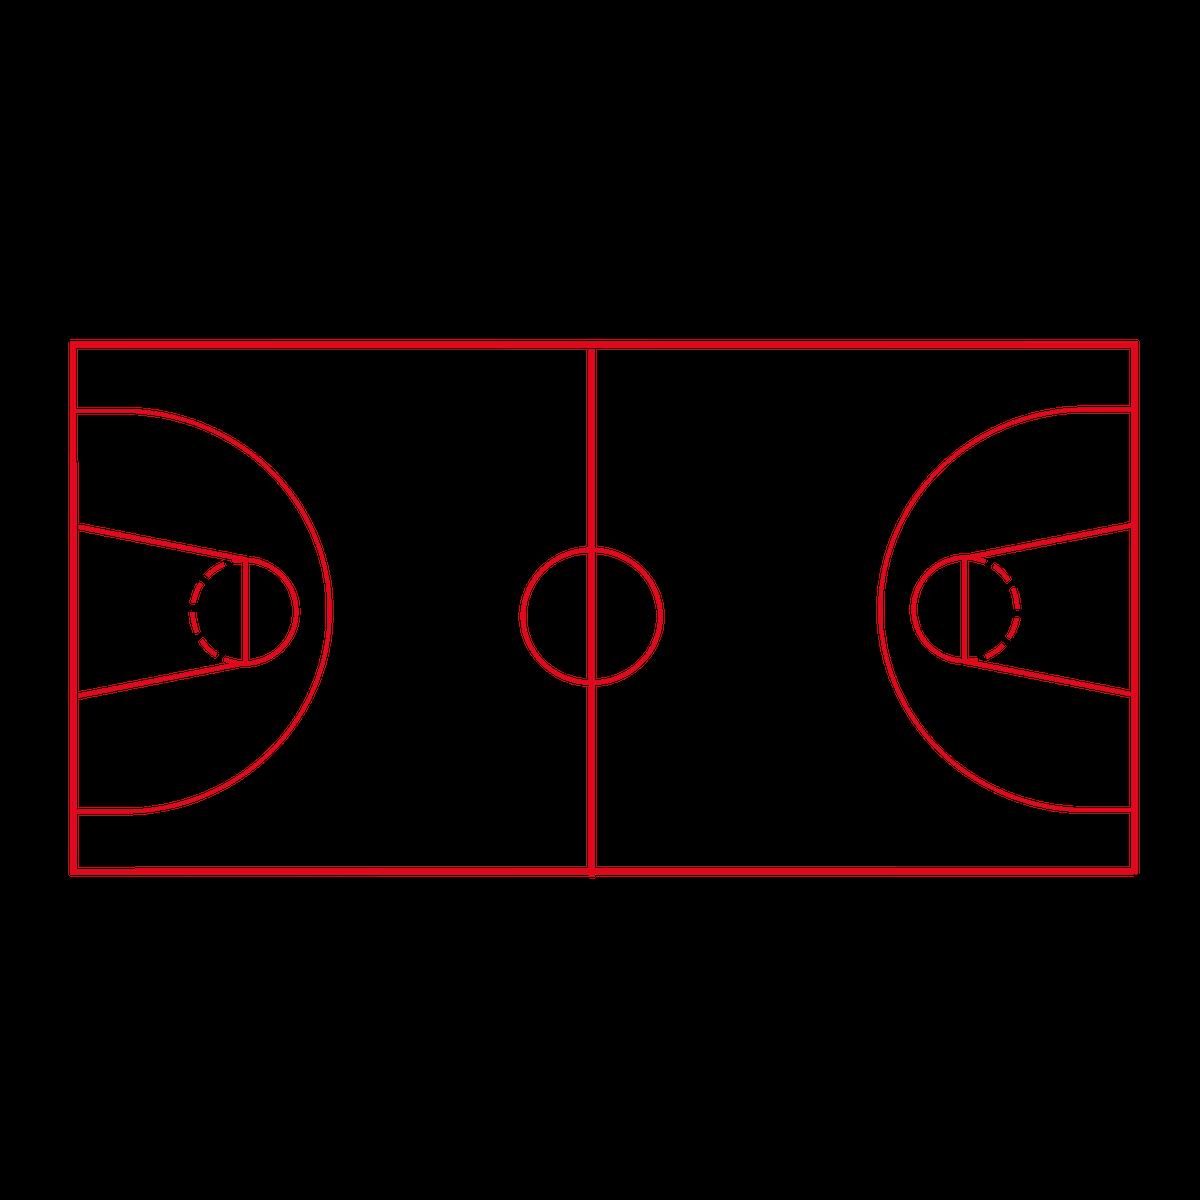 Playground Marking Basketball Court